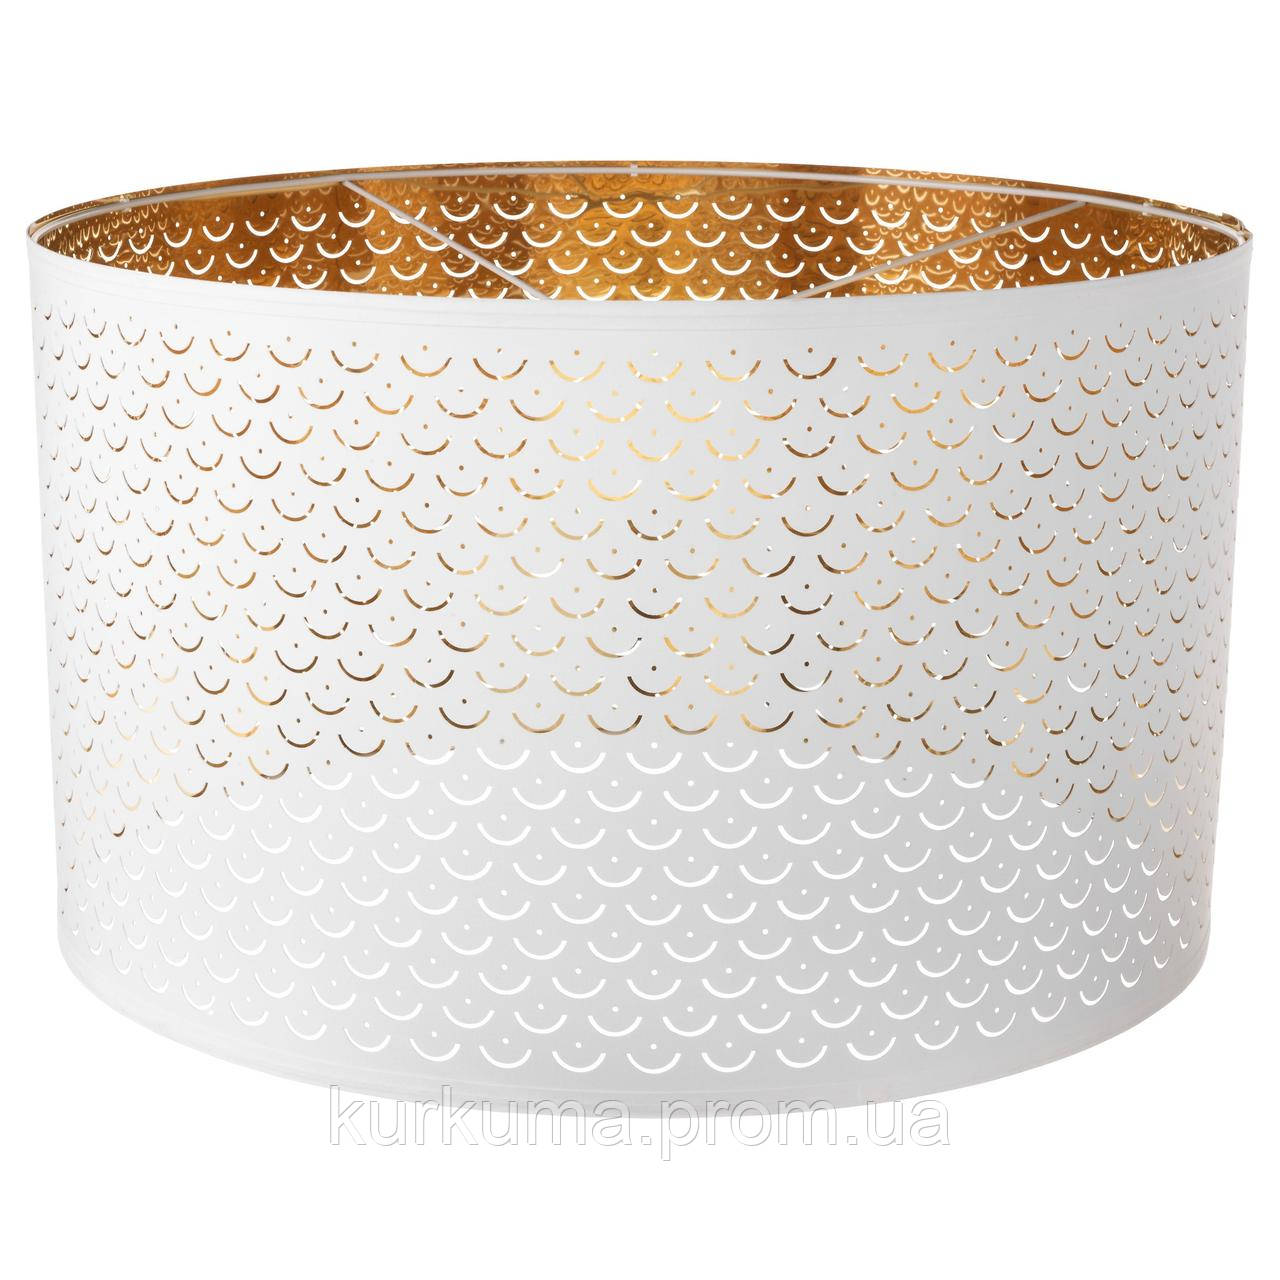 IKEA NYMO Абажур, белый, латунь цвет  (503.408.32)